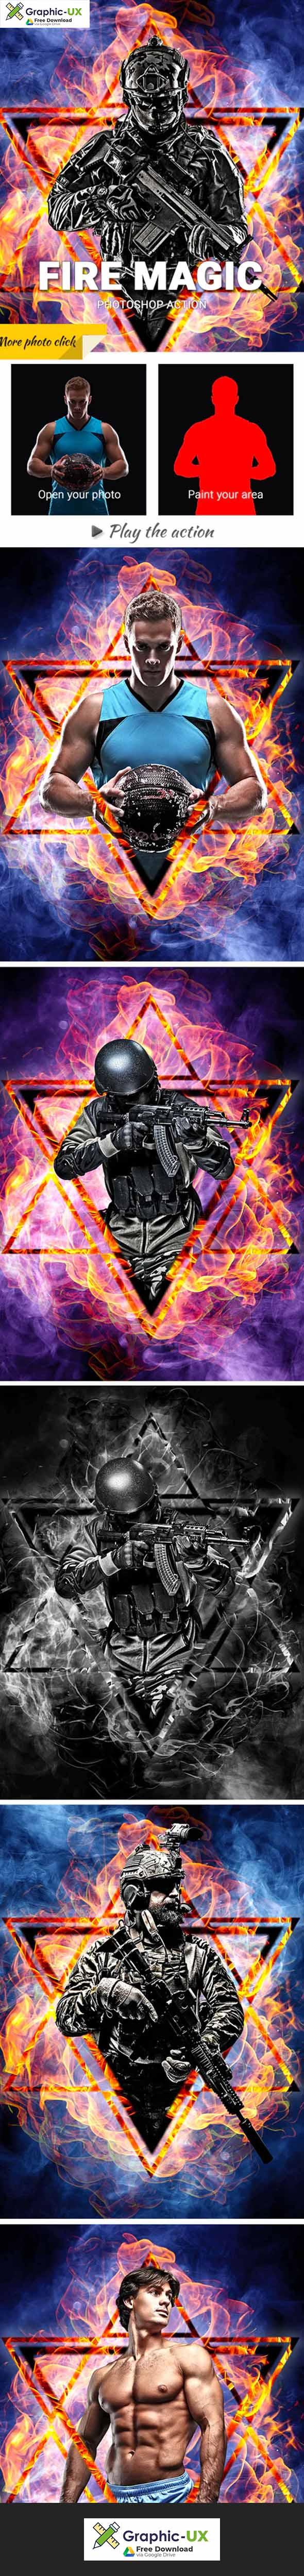 Fire Magic Photoshop Action